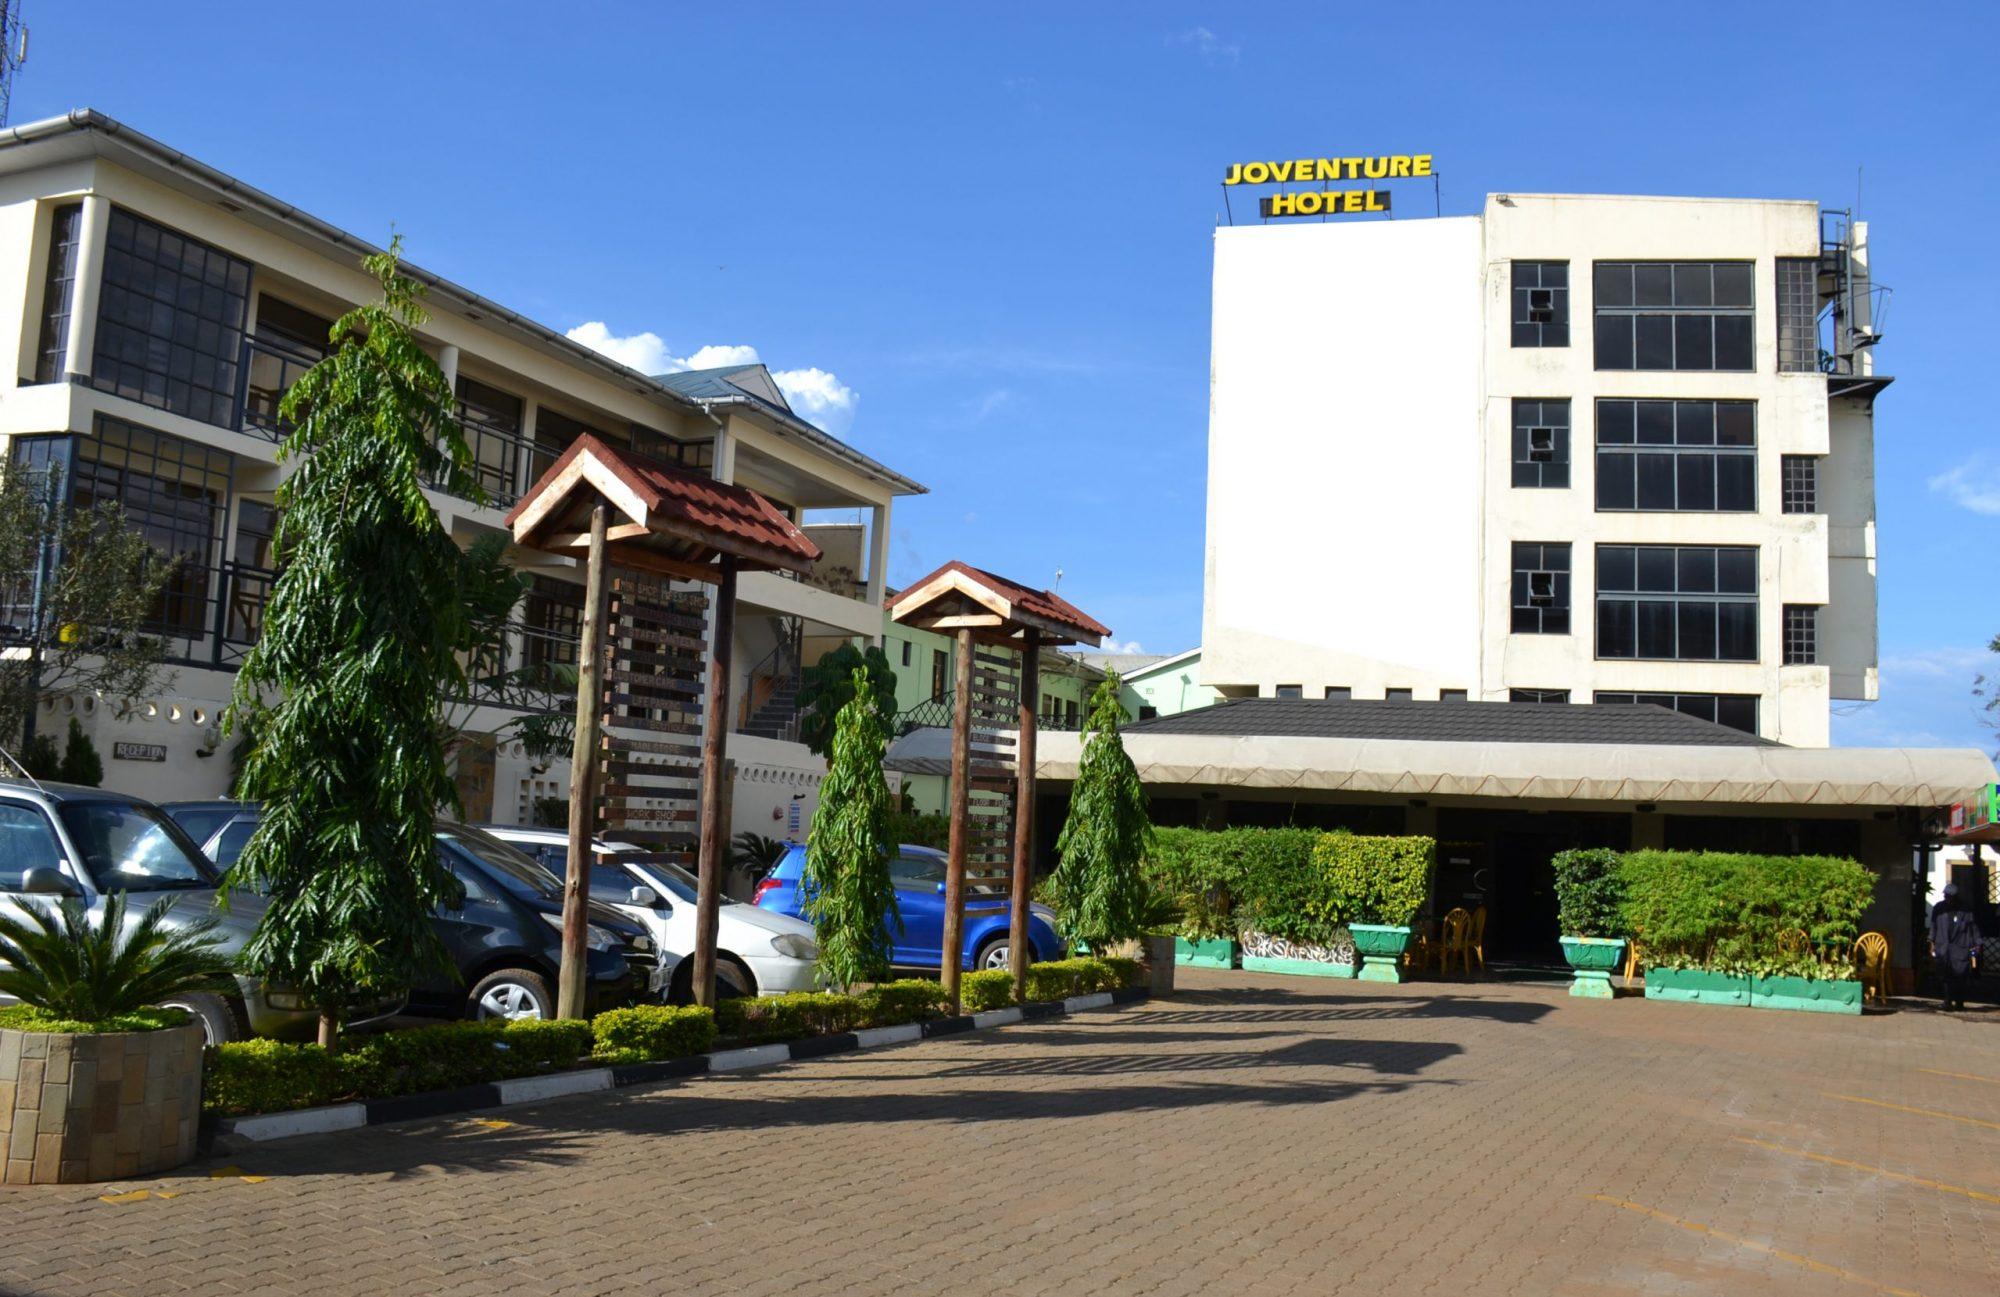 JOVENTURE HOTEL KISUMU